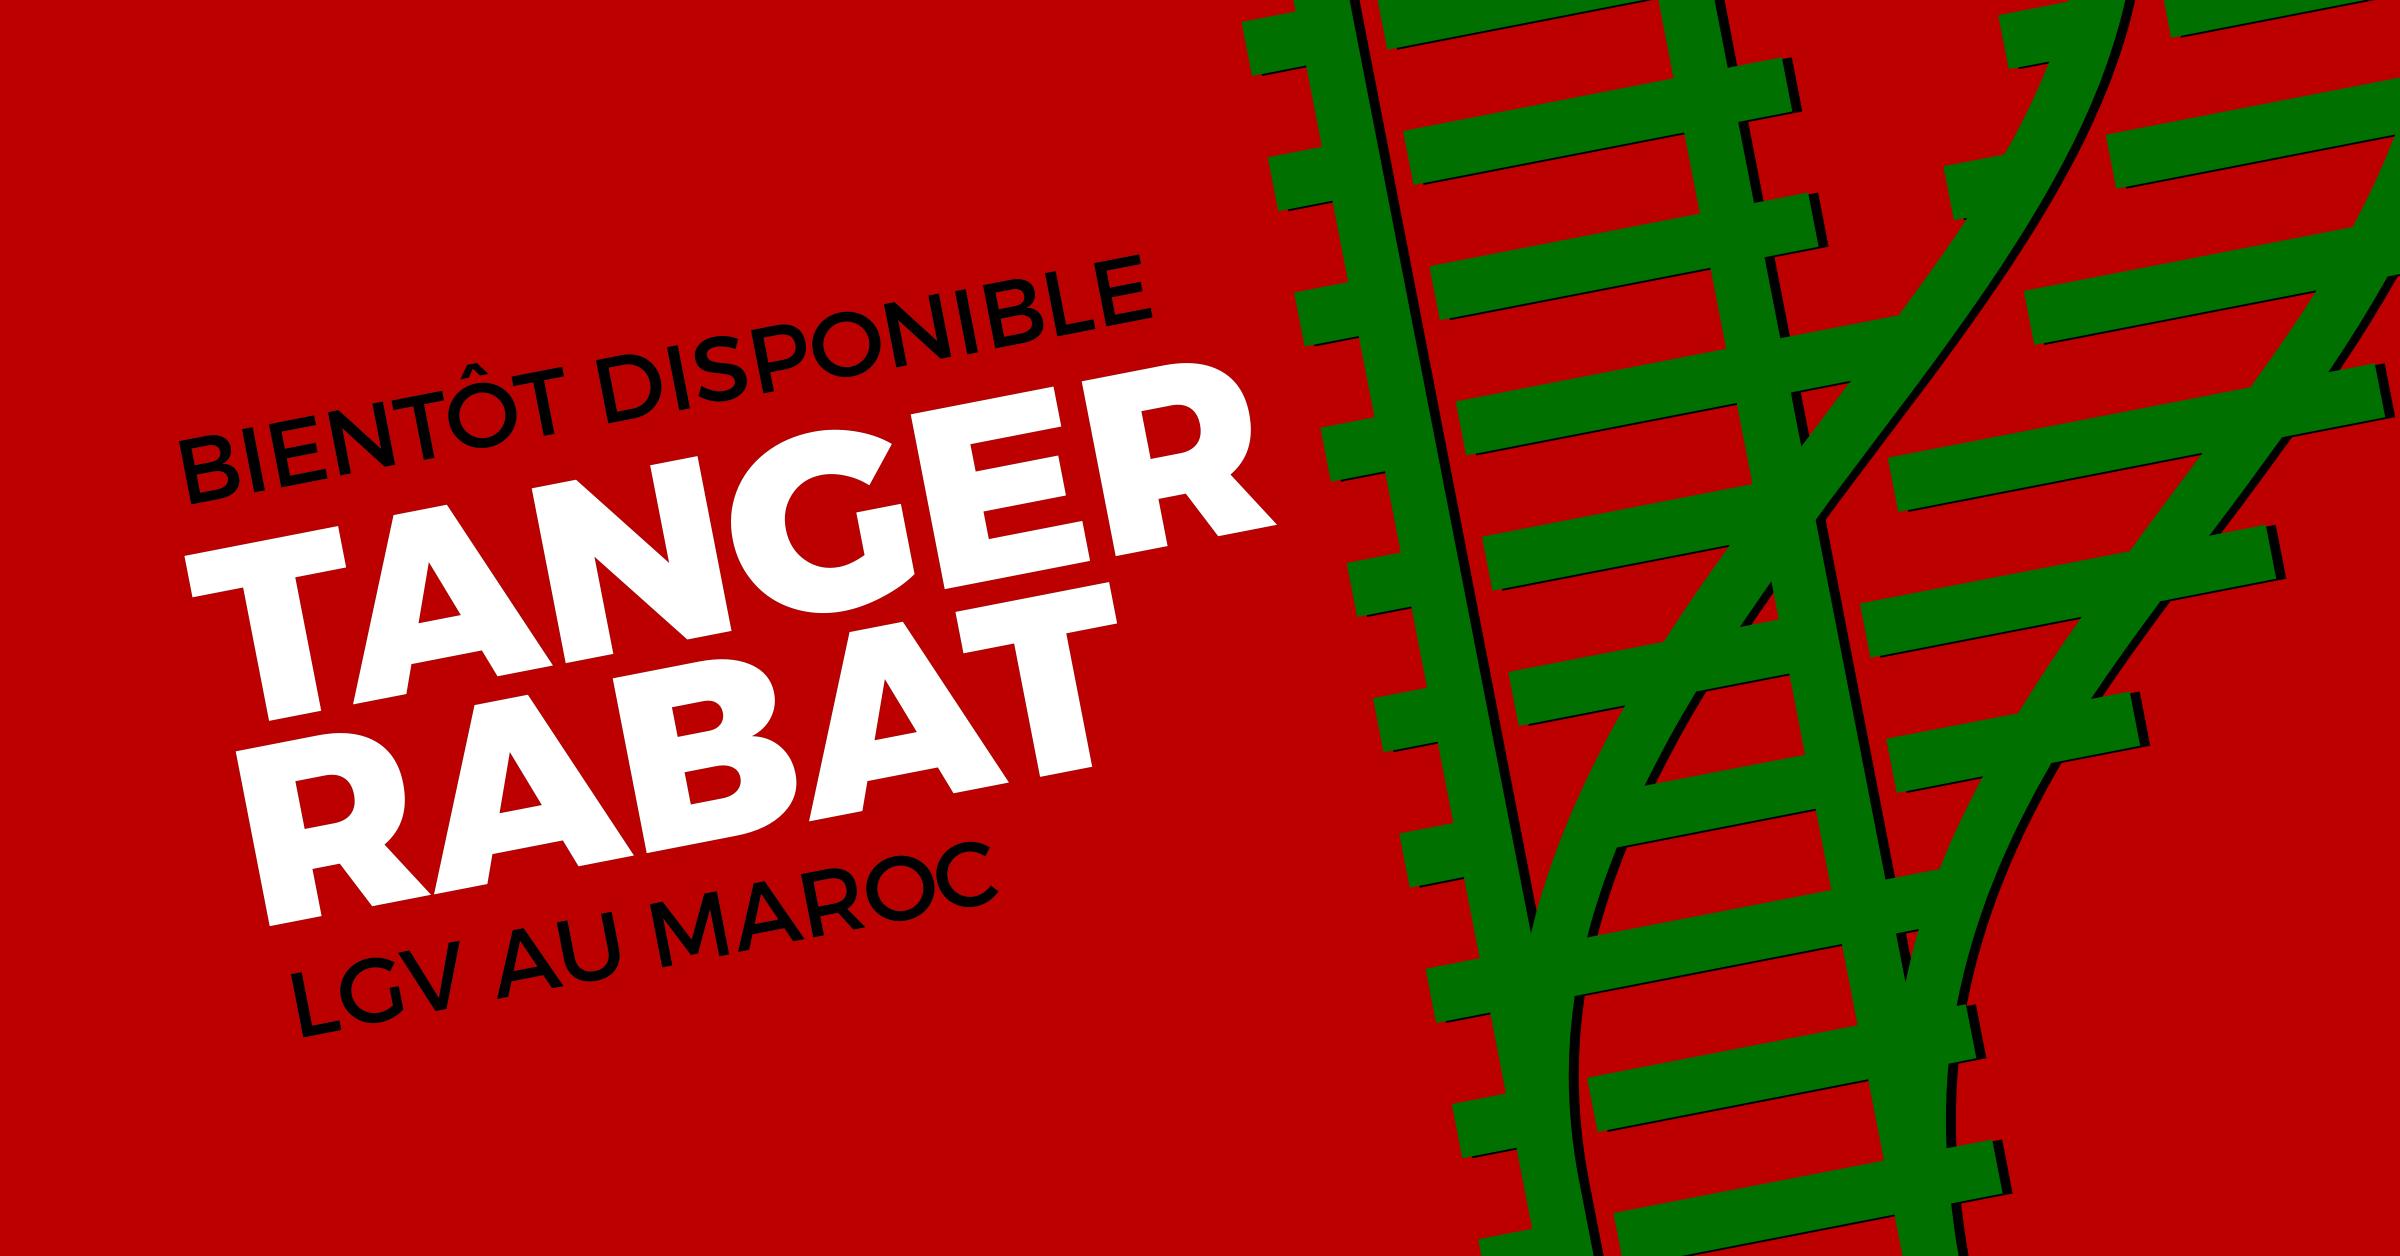 LGV Trajet Tanger – Casablanca